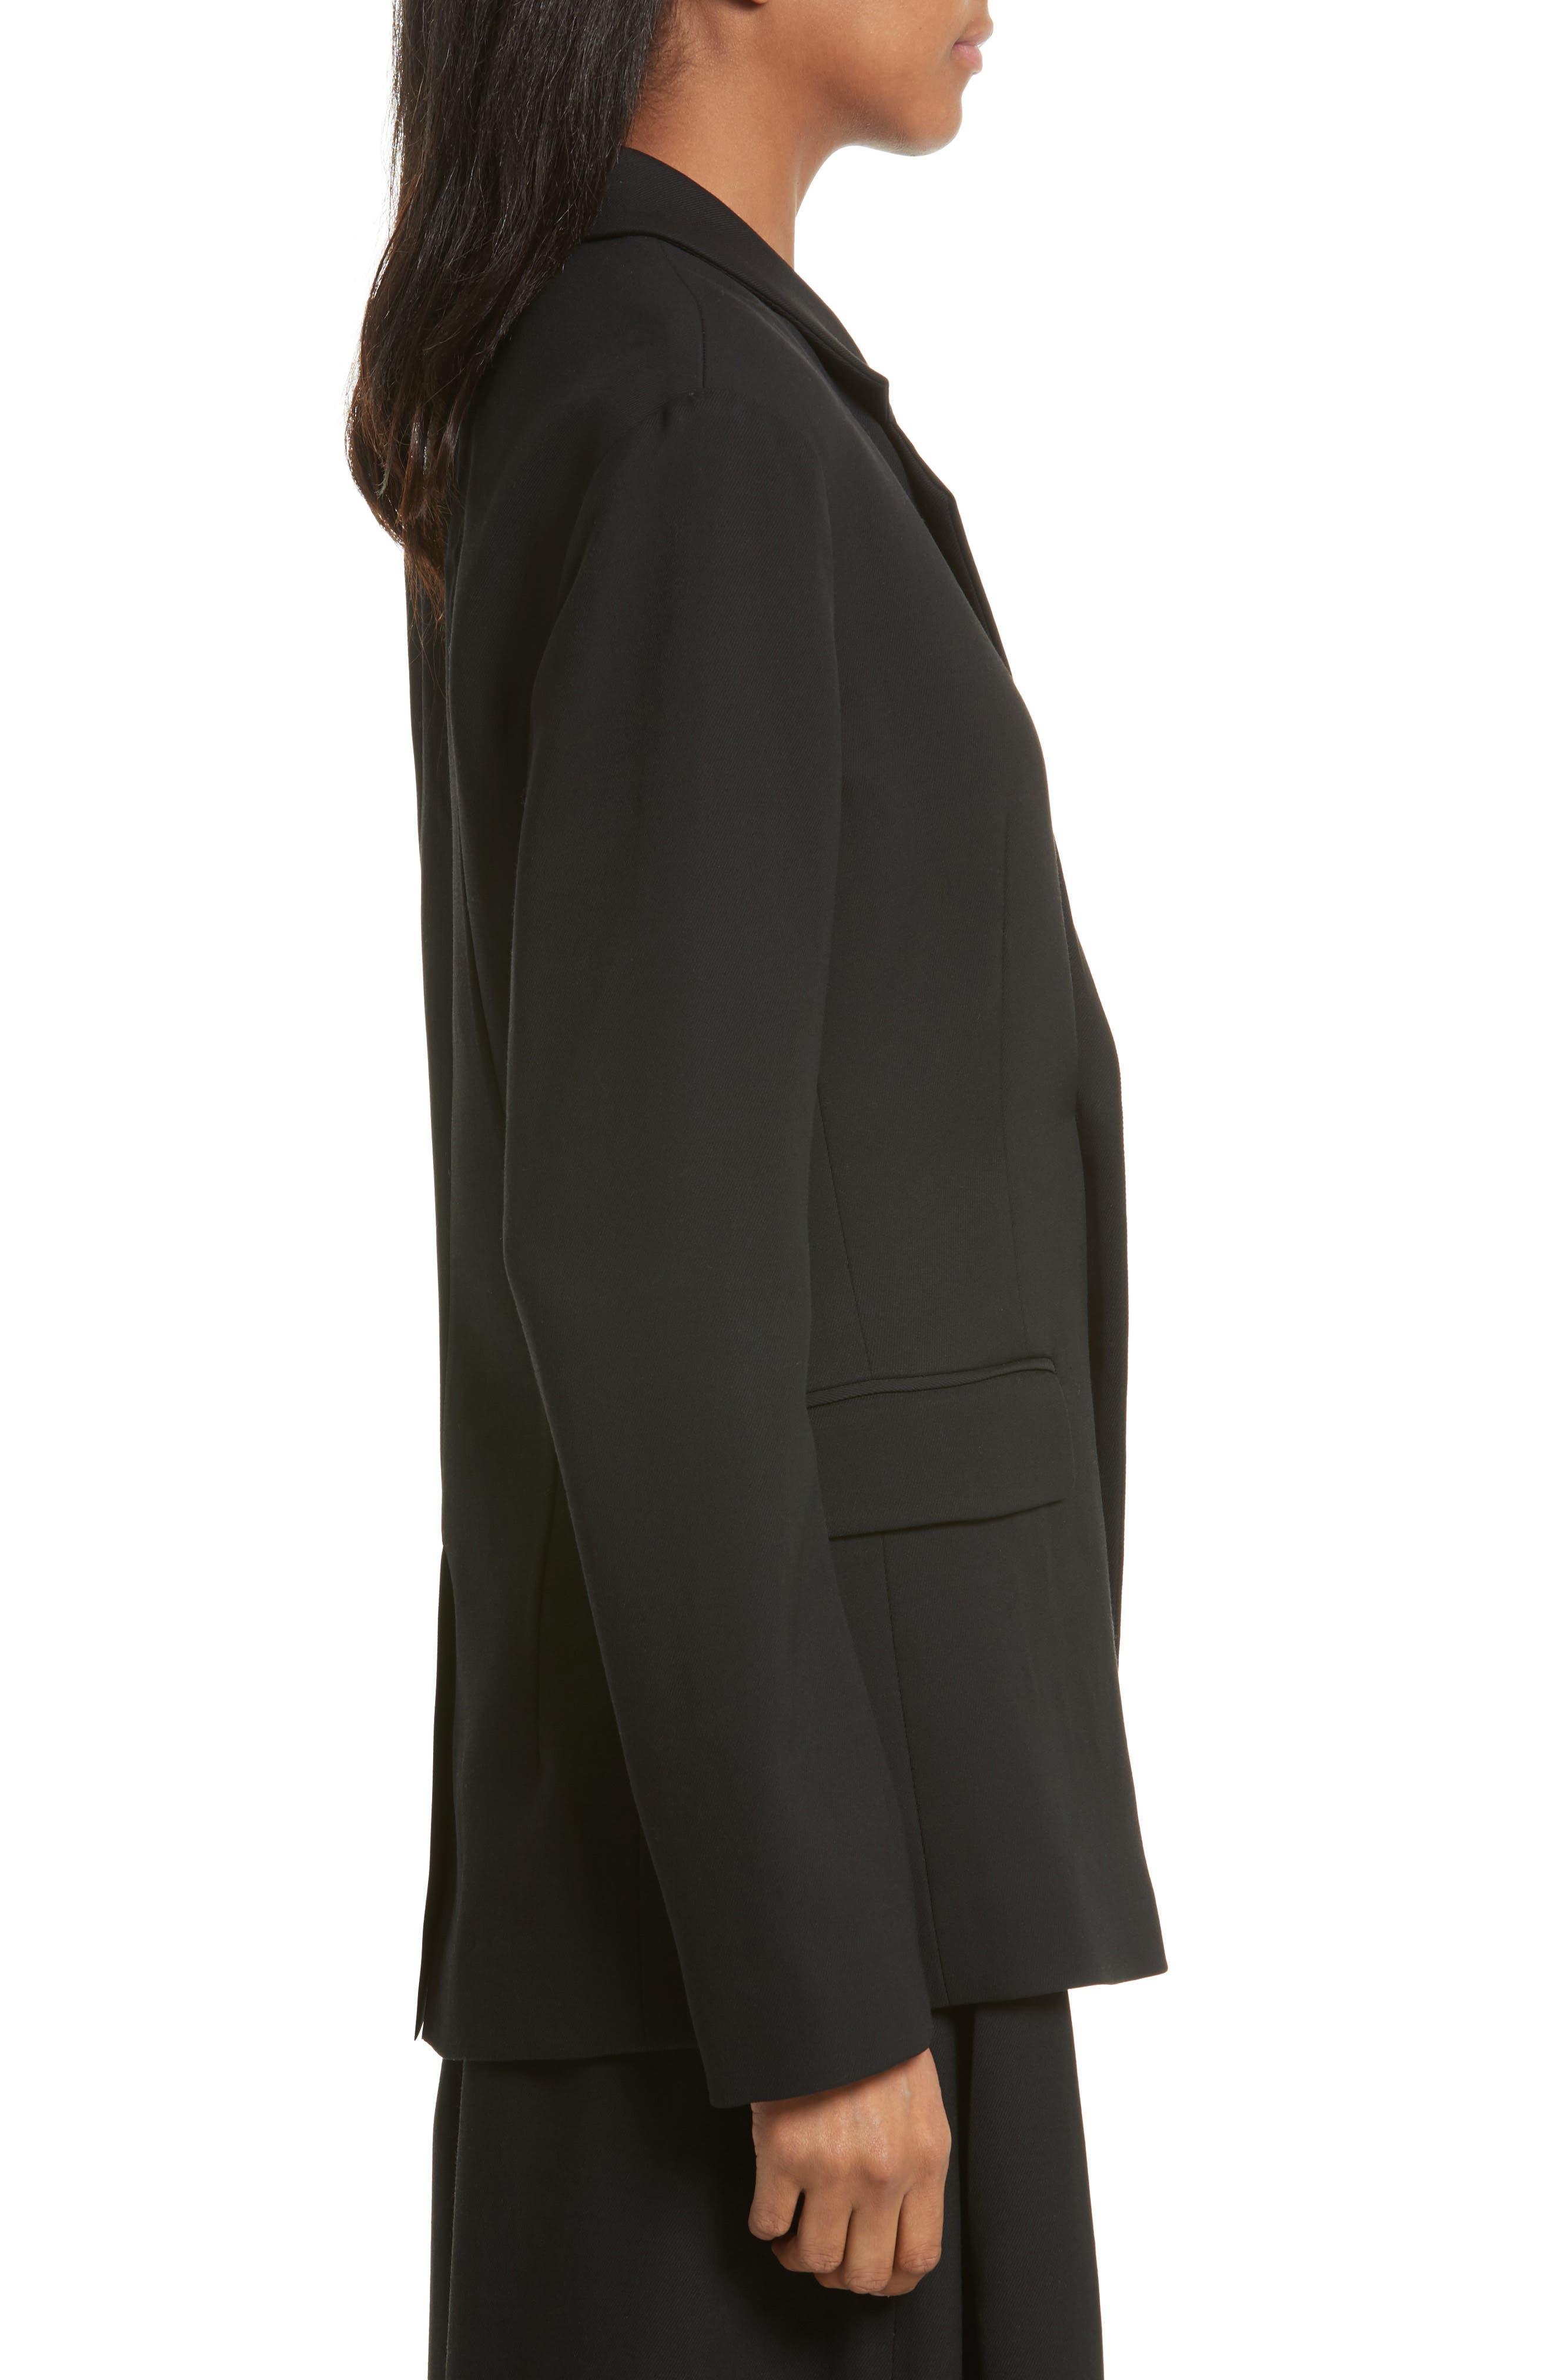 Classon Jacket,                             Alternate thumbnail 4, color,                             Black